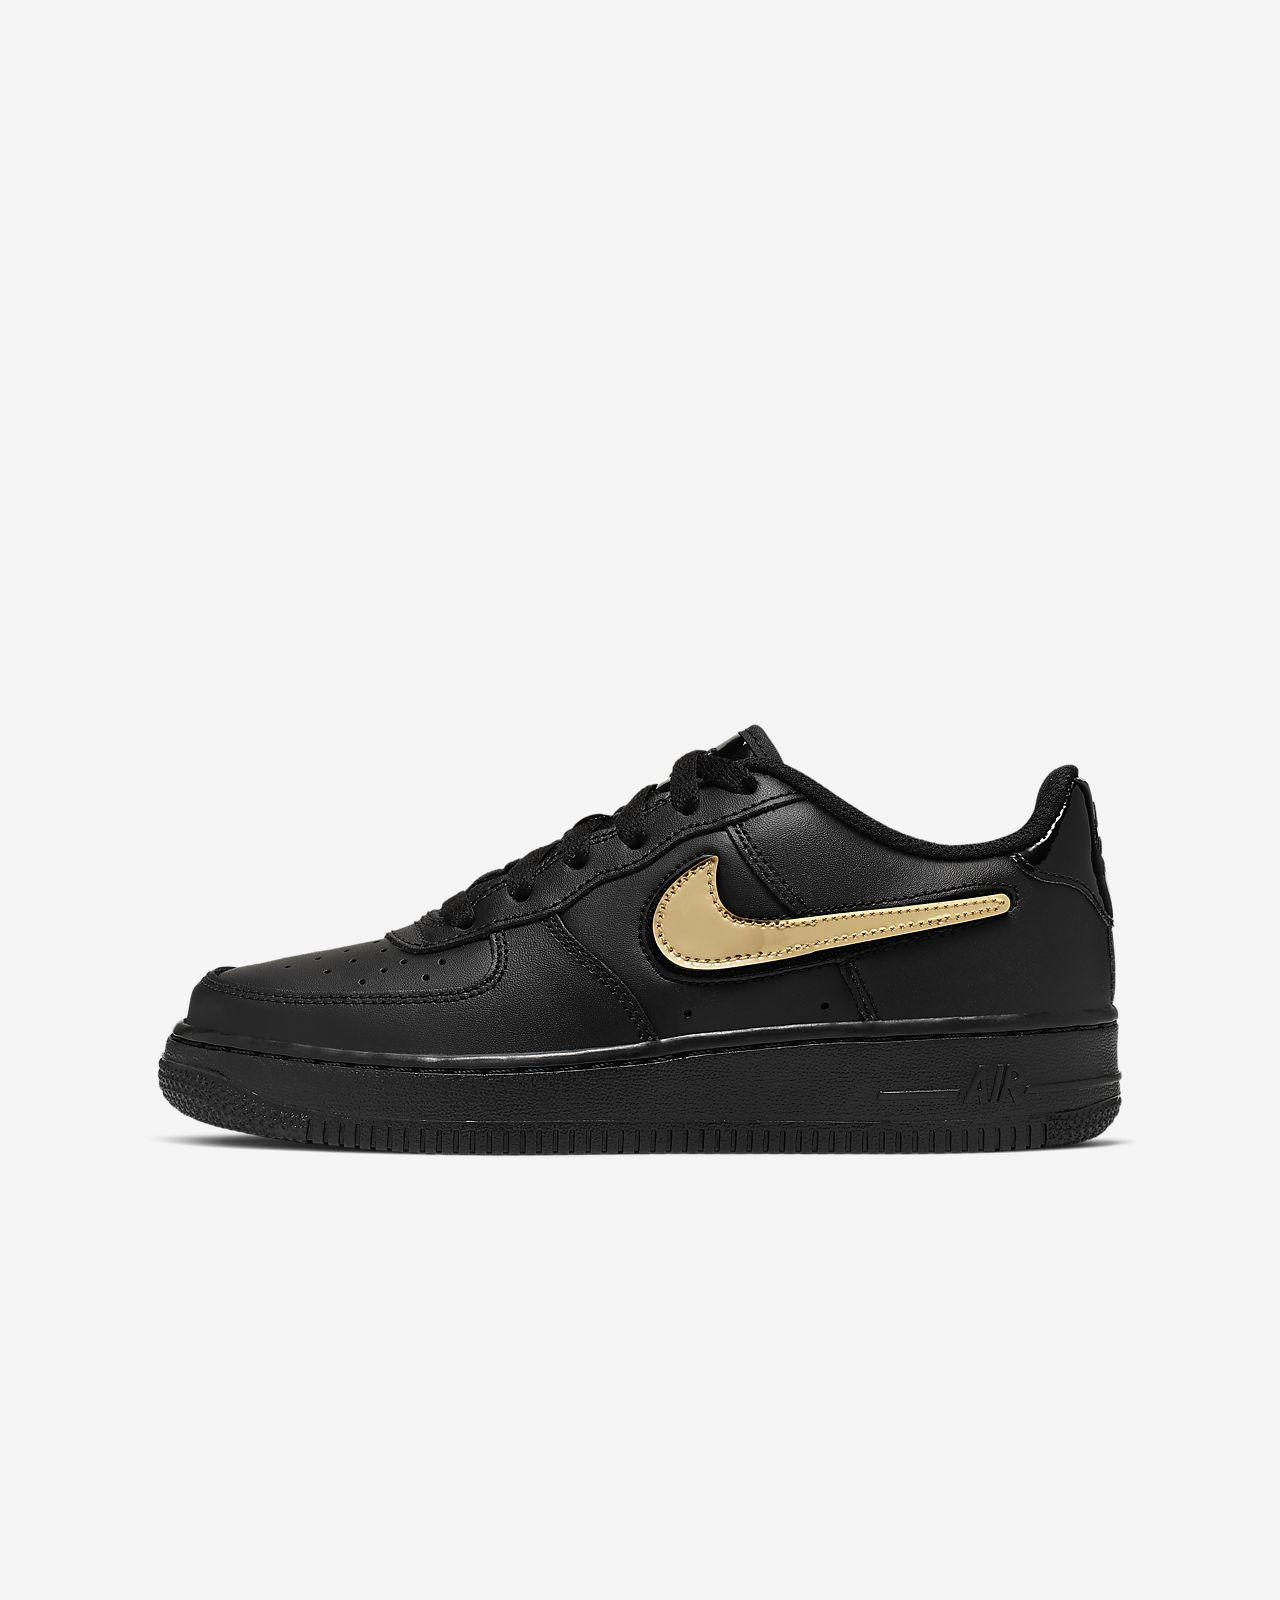 Nike Air Force 1 LV8 3 Kinderschoen